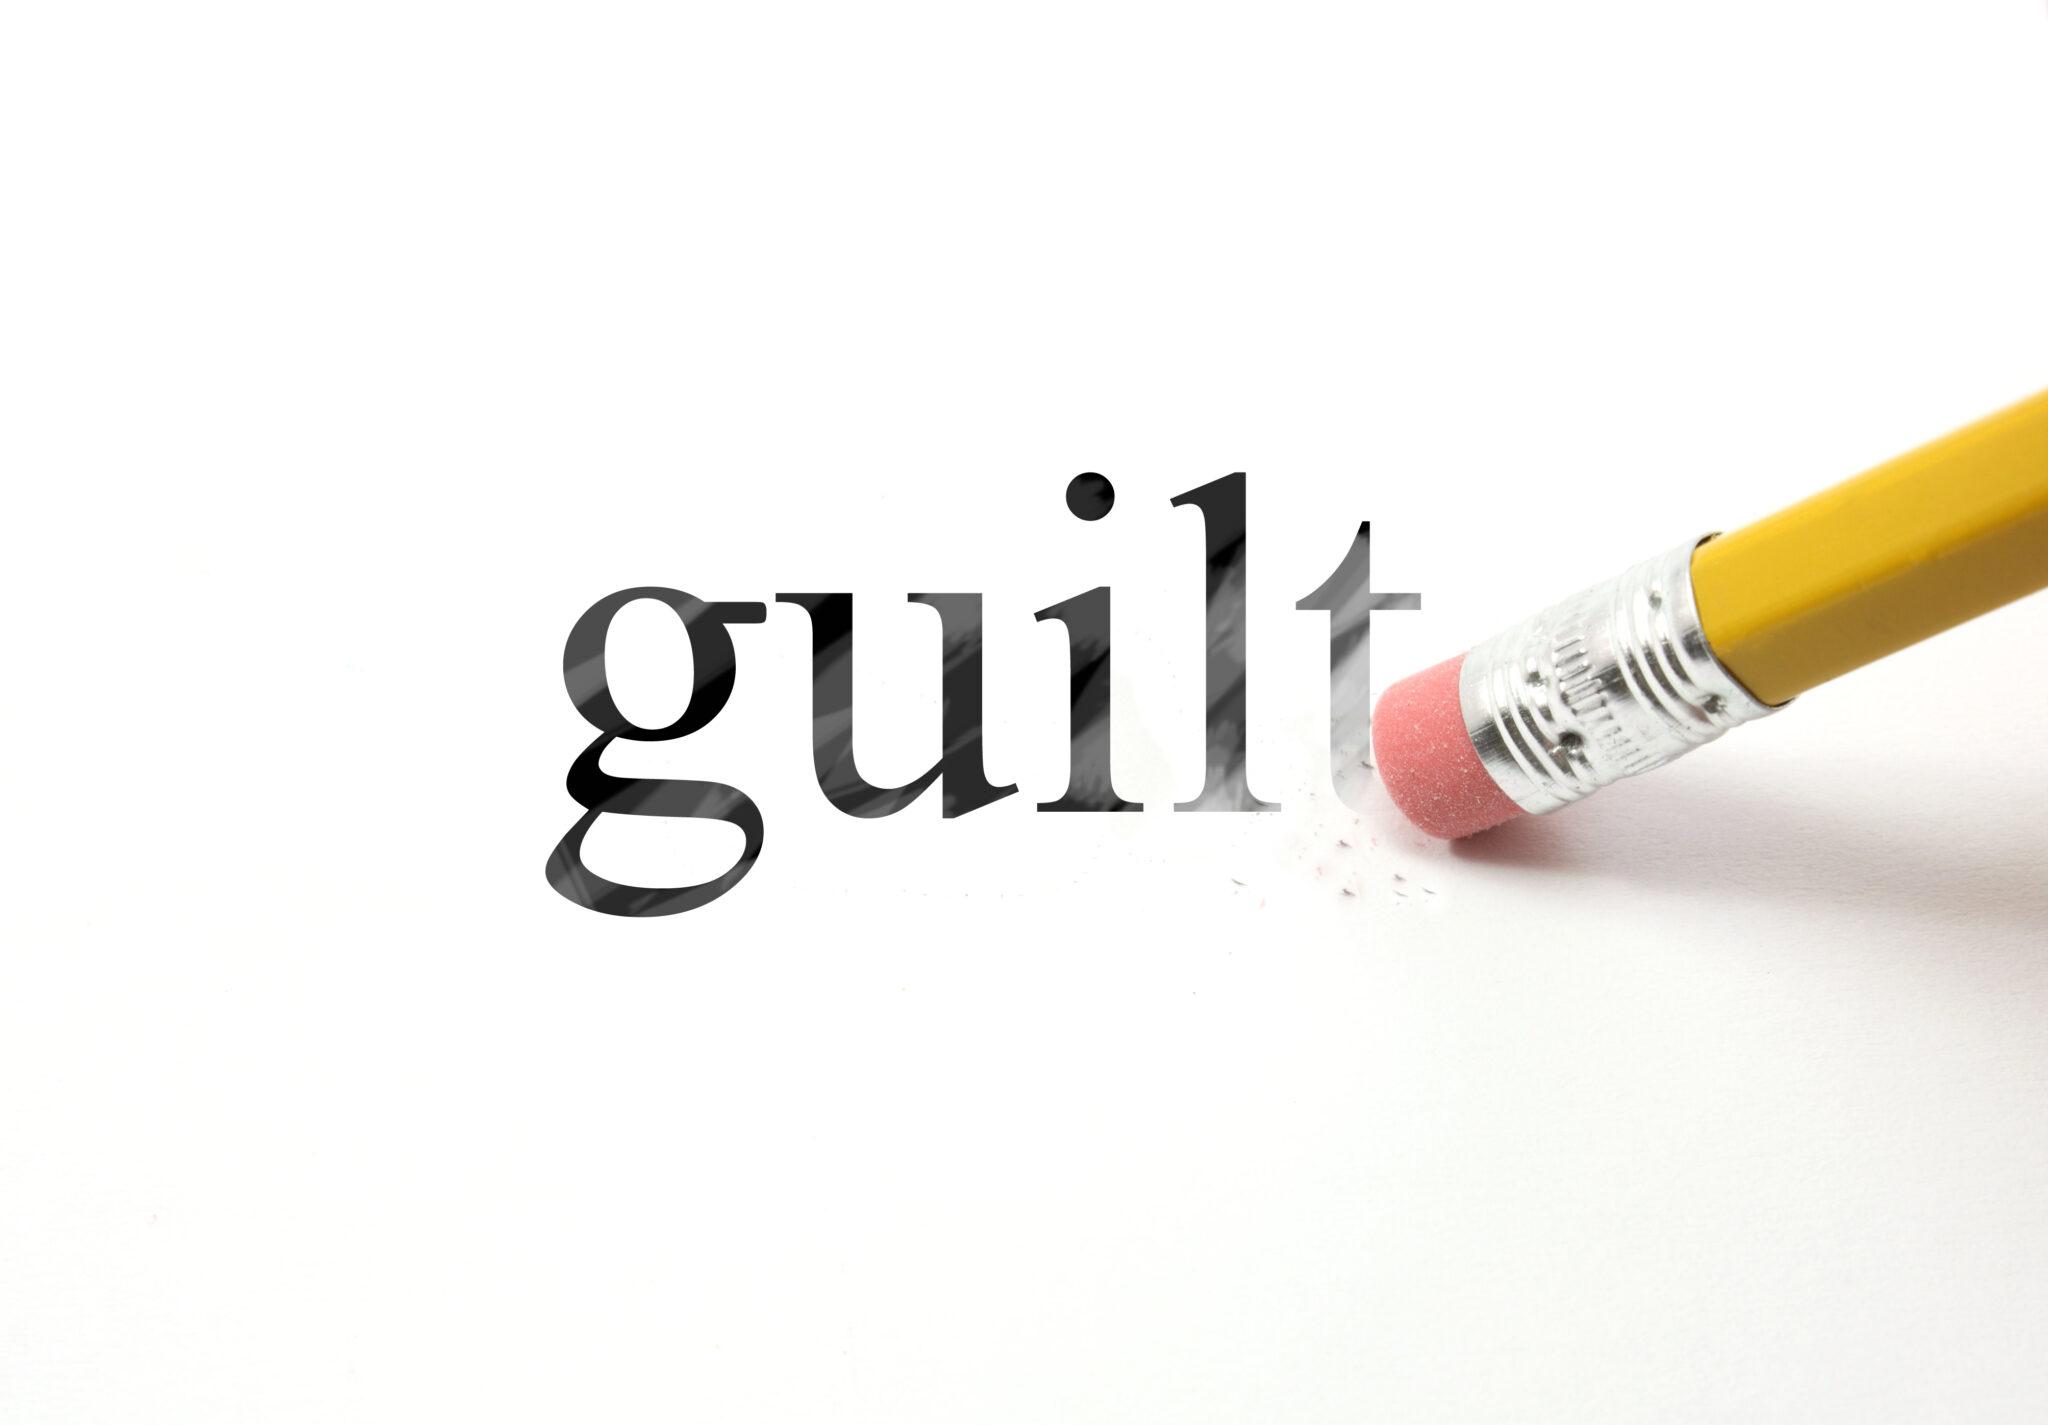 Dealing with Guilt as a Parent